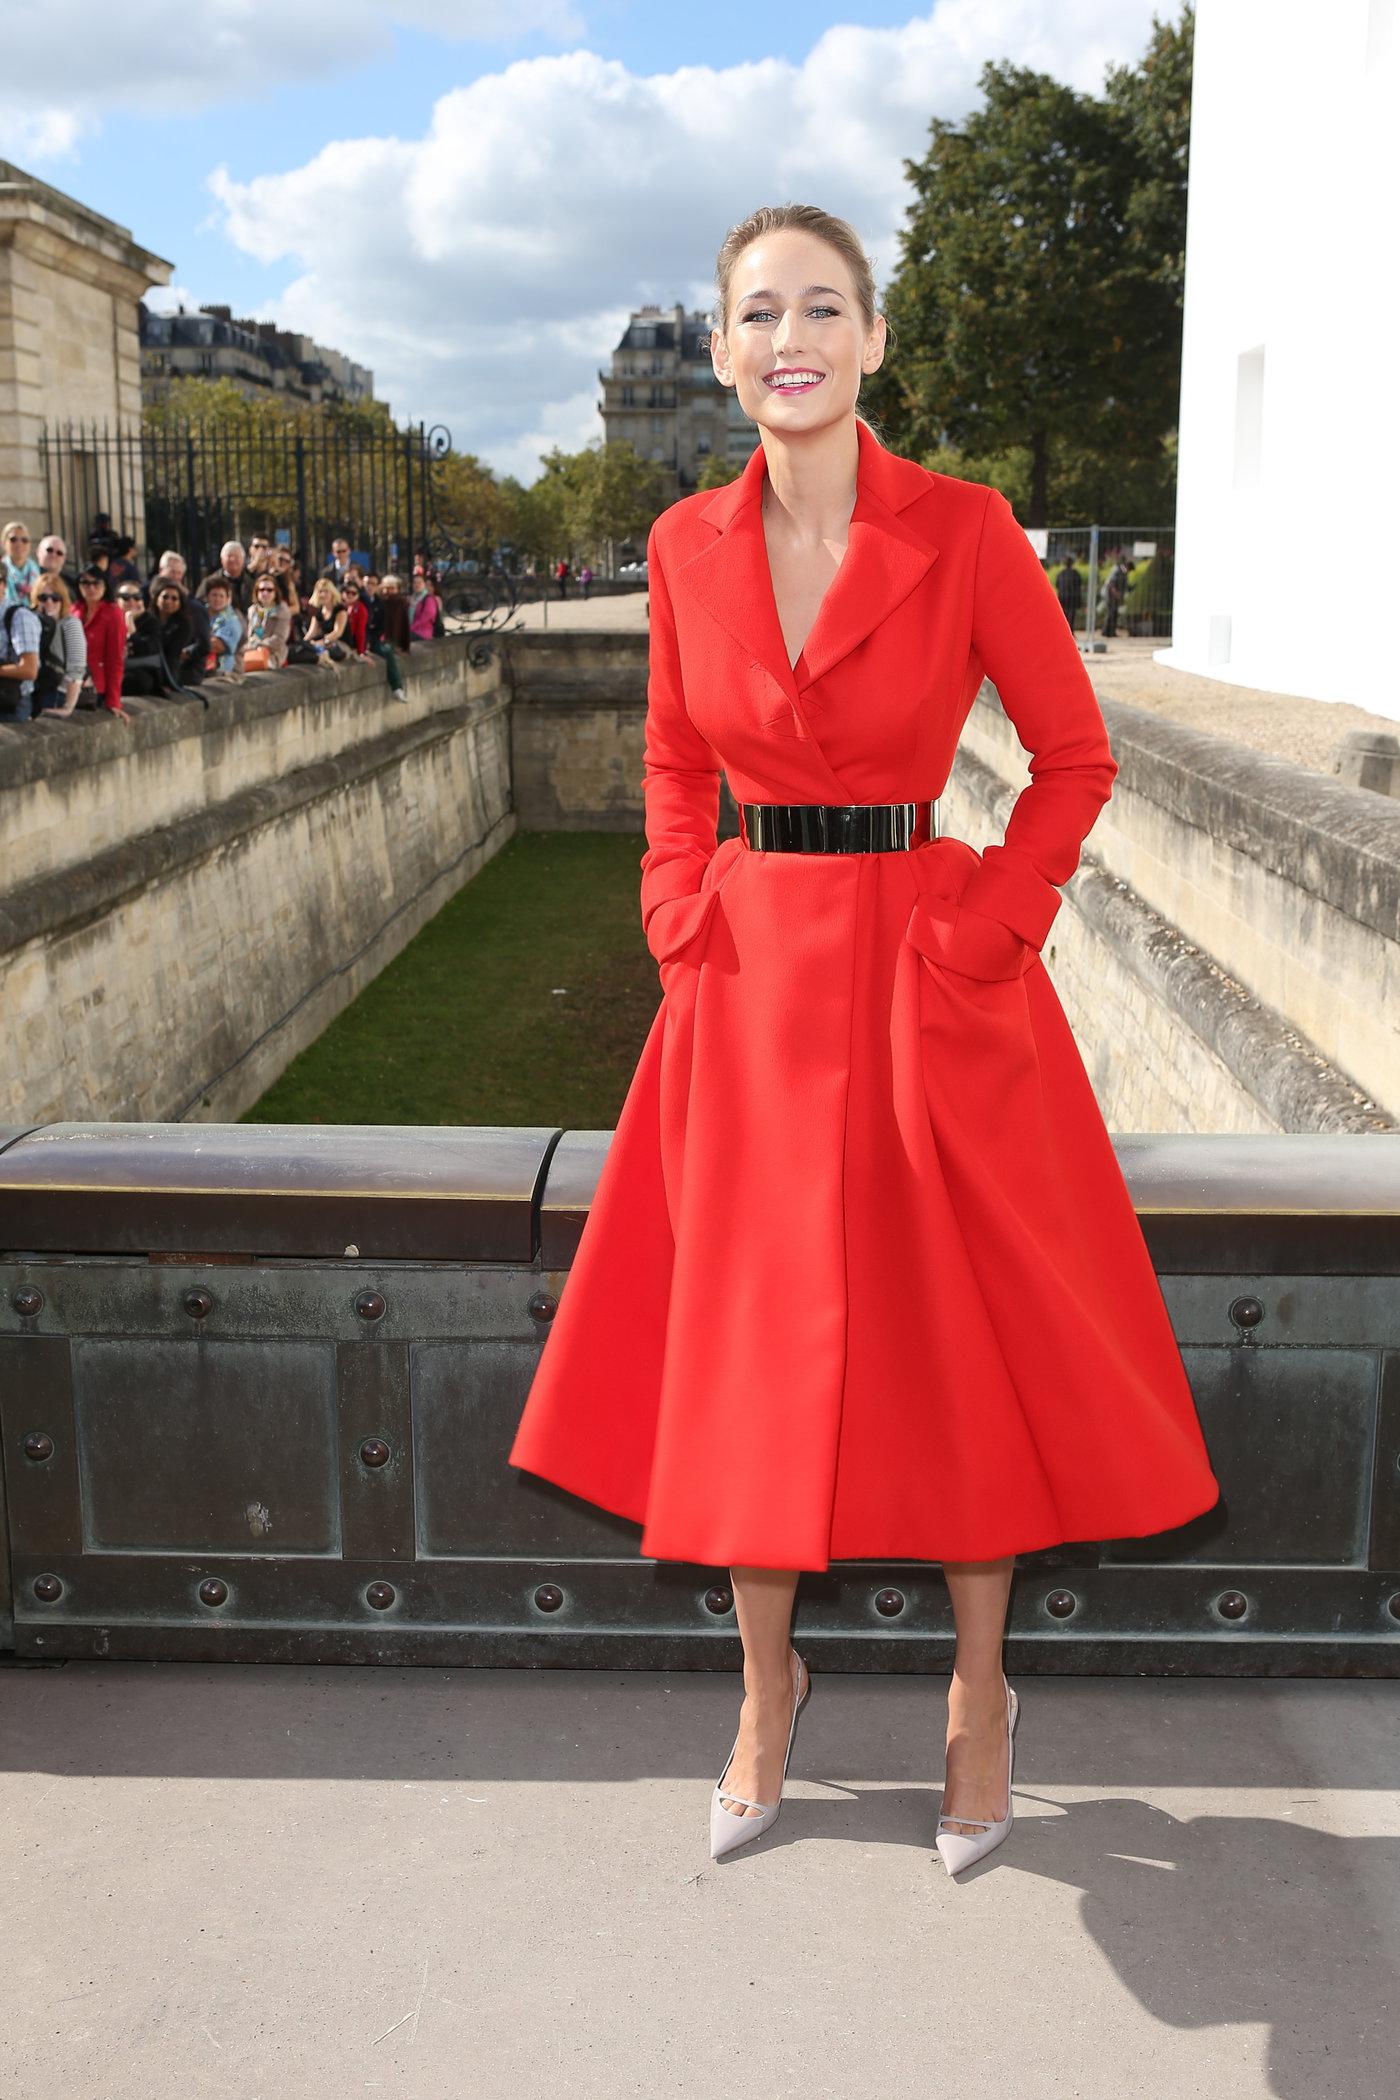 Leelee Sobieski at Christian Dior fashion show Paris 9/28/12